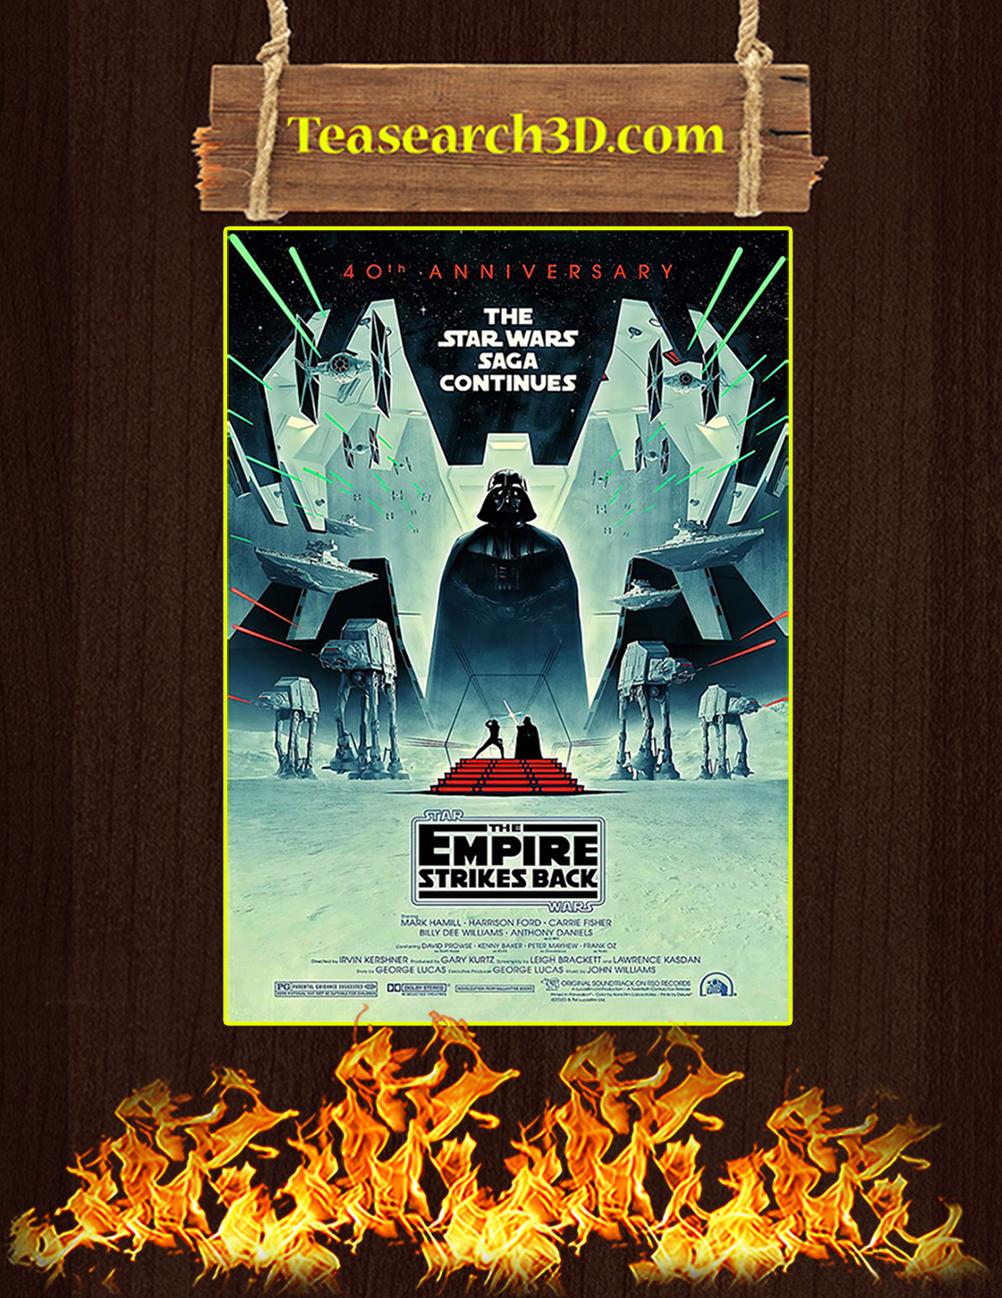 The star wars saga continues 40th anniversary poster